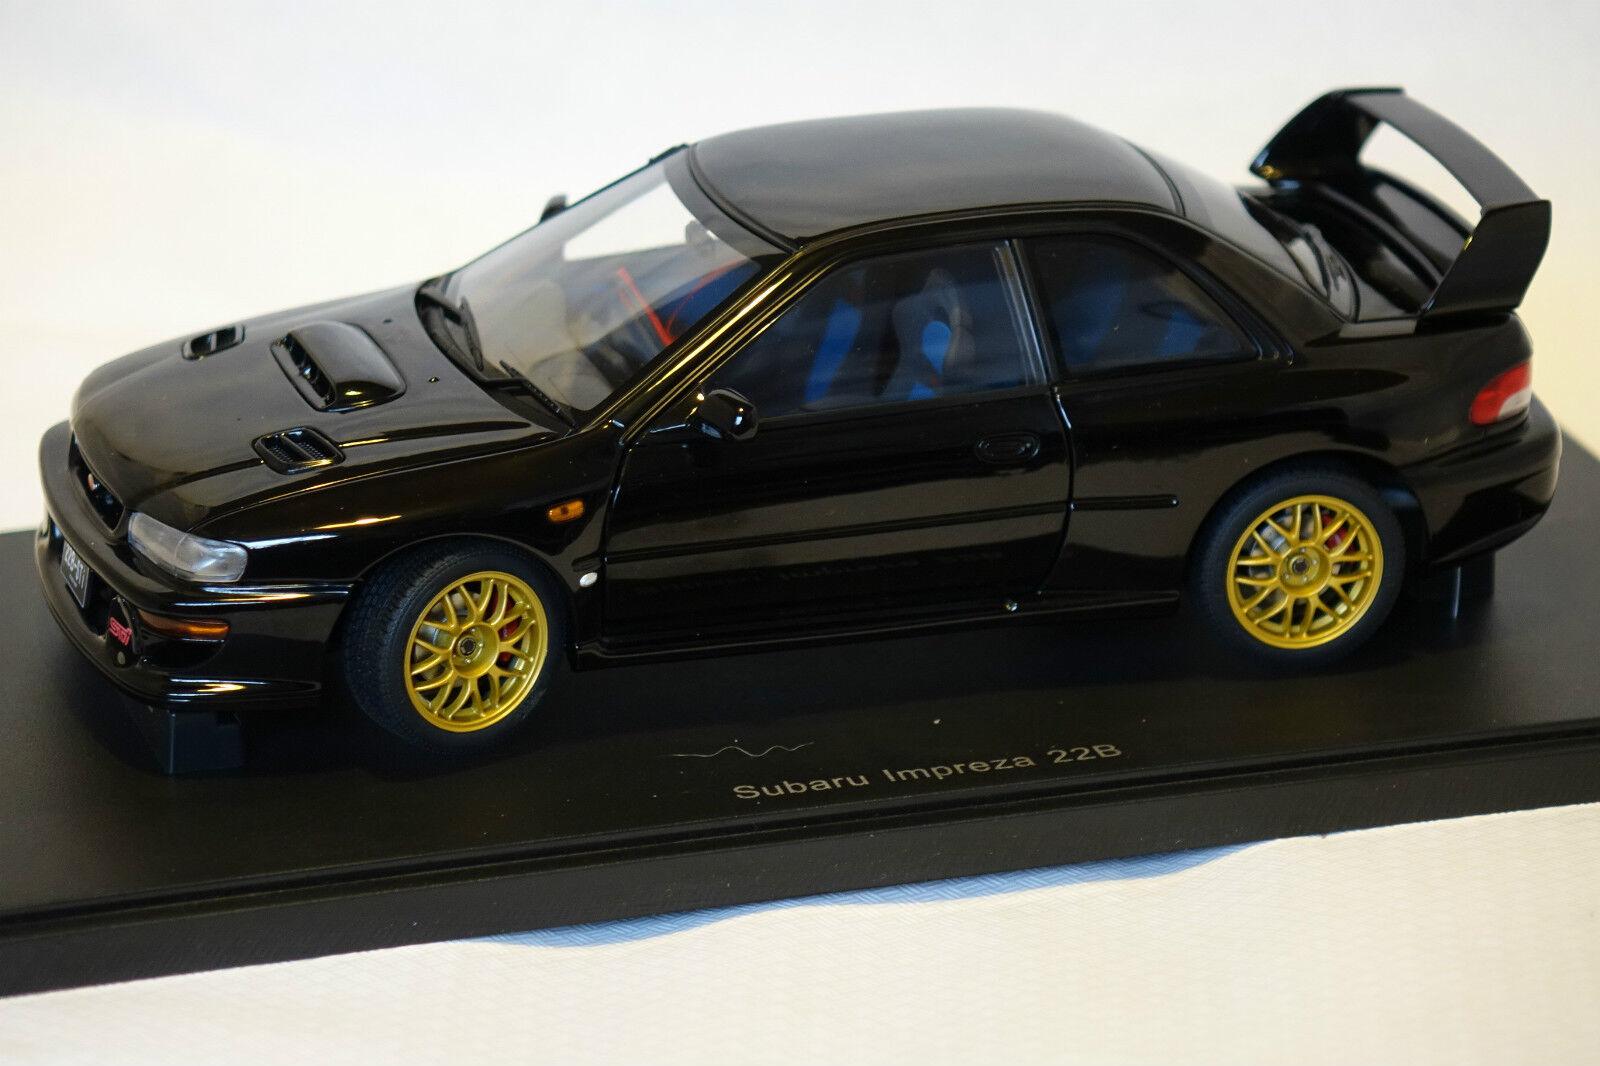 Subaru Impreza 22B-STI 1998 Nr.1048 of 1500 black 1 18 AUTOart neu & OVP 78603